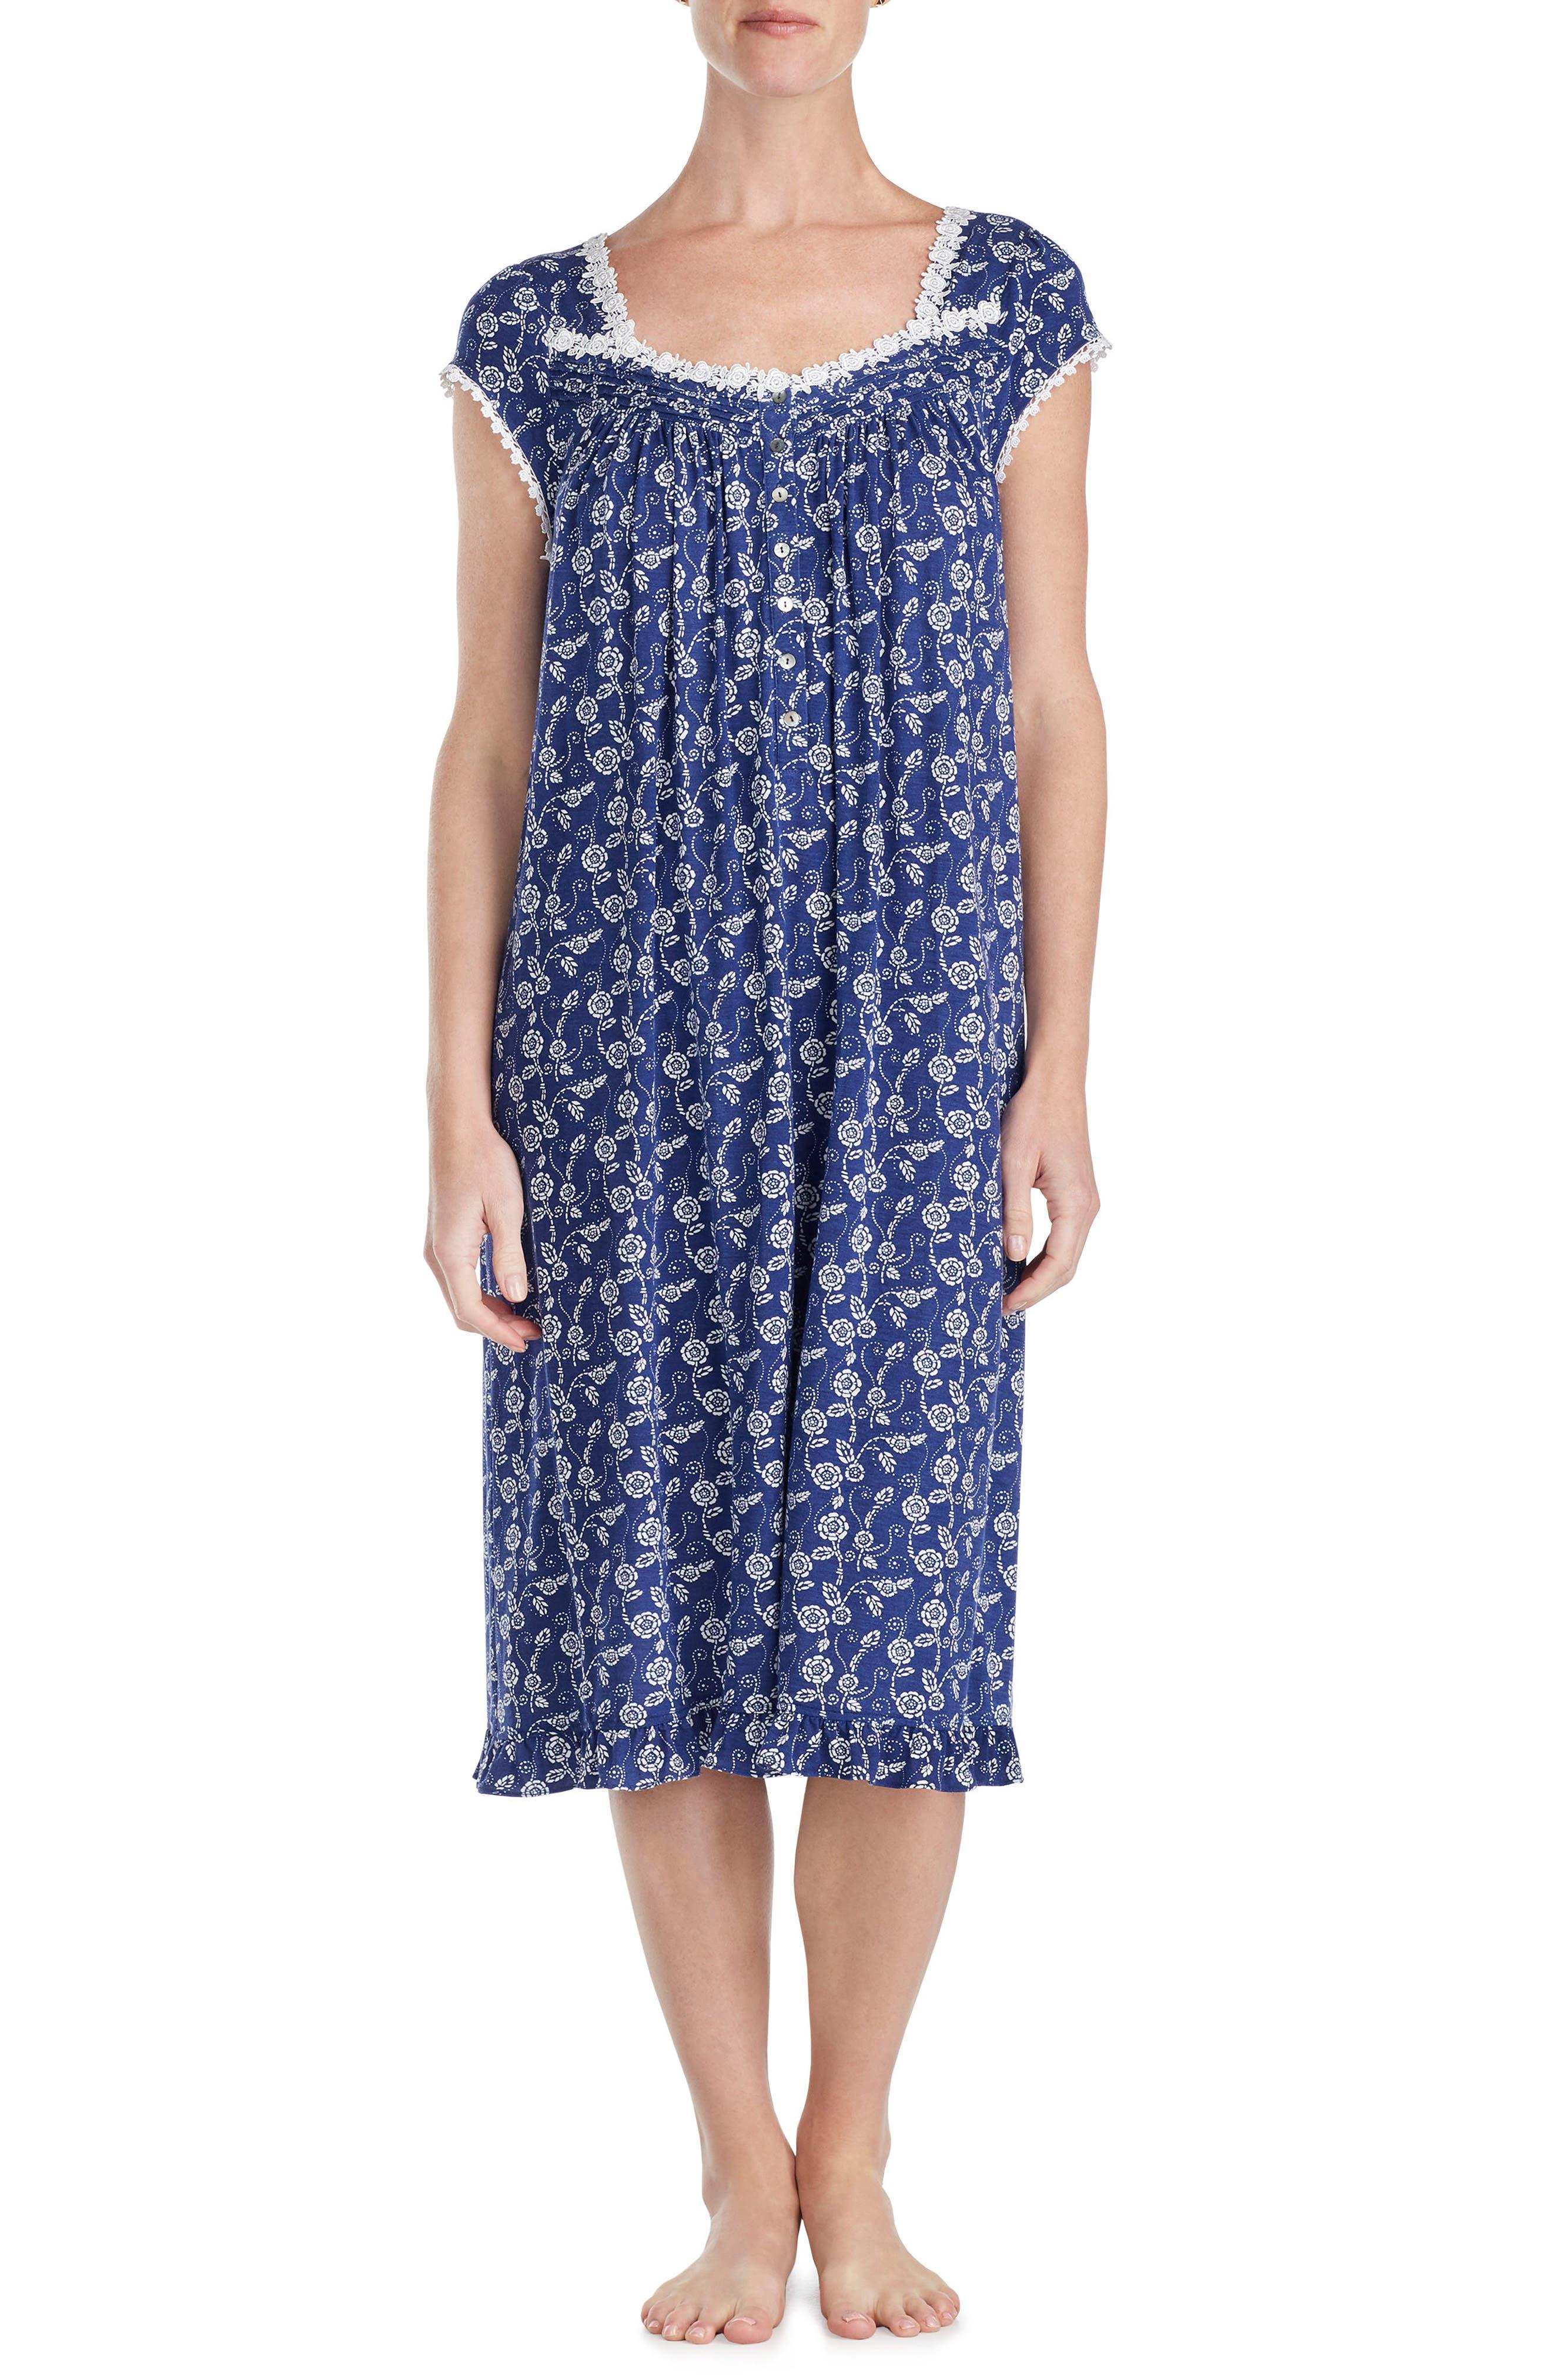 Floral Print Nightgown,                         Main,                         color, Indigo Print